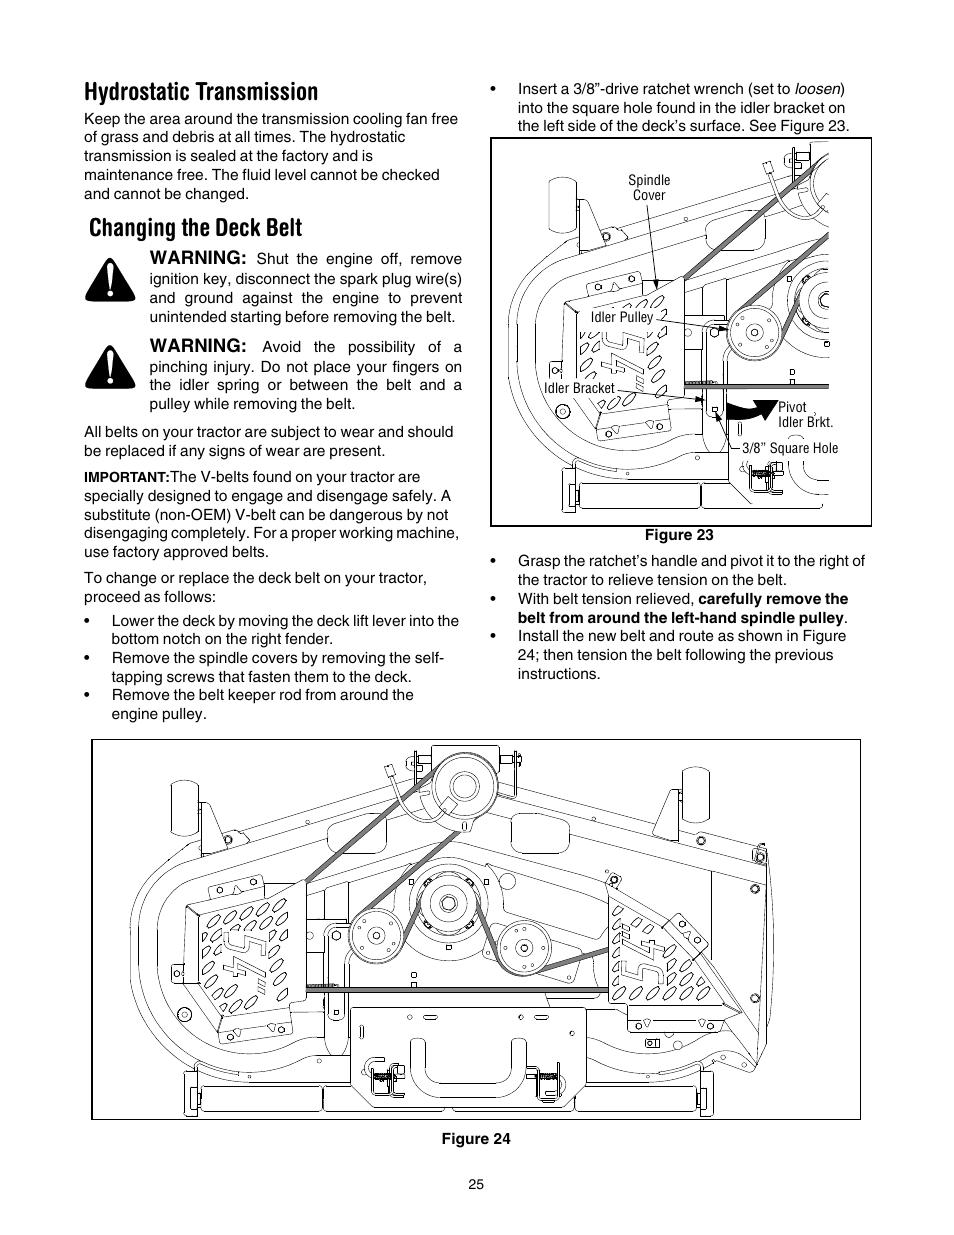 Cub Cadet Gt1554 Belt Diagram Modern Design Of Wiring Deck Hydrostatic Transmission Changing The Gt 1554 Rh Manualsdir Com